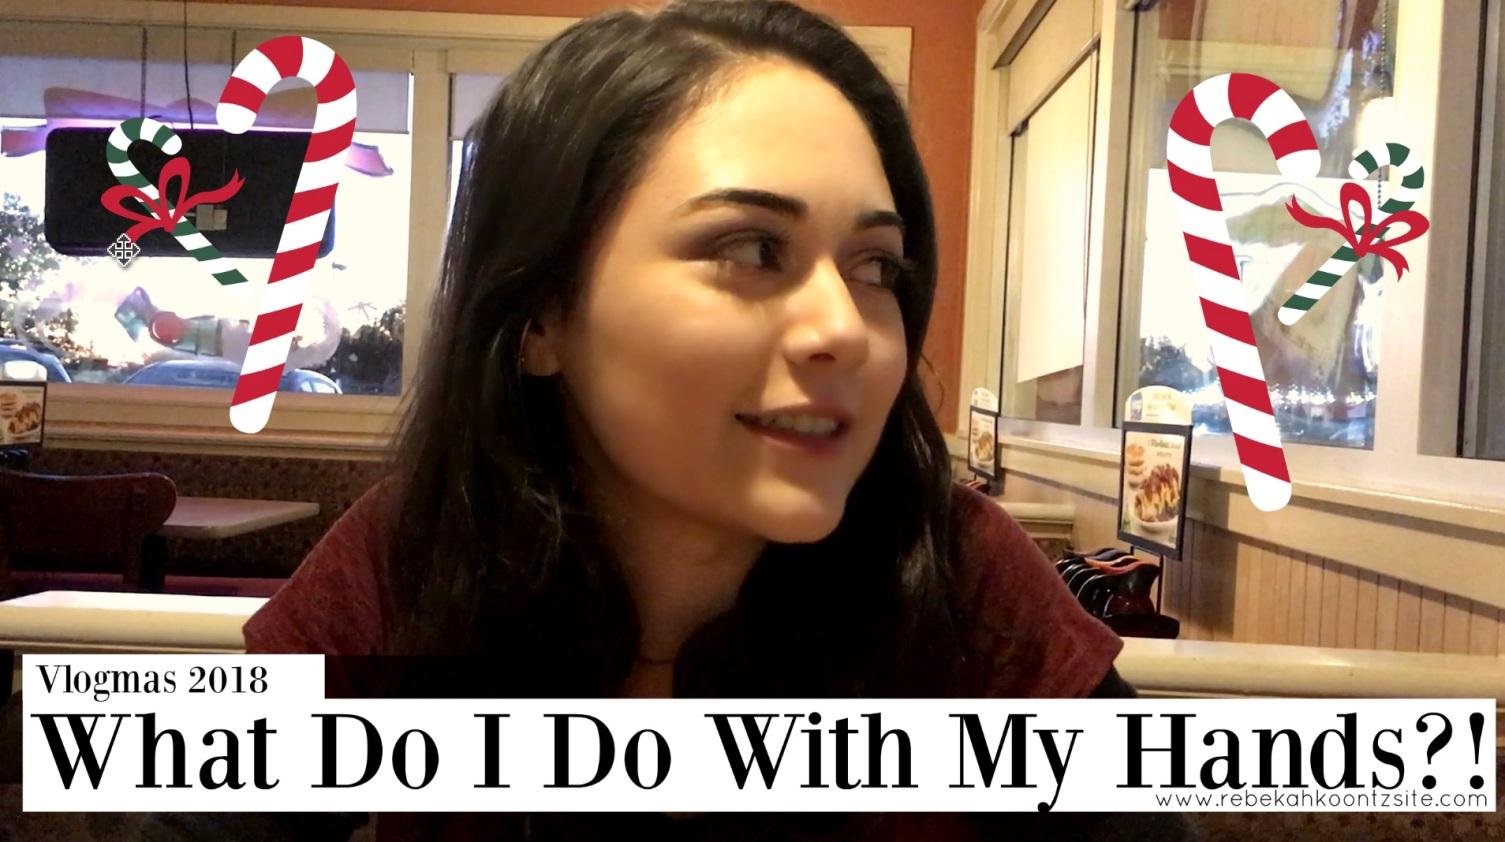 Vlogmas 2018 Rebekah Rebecca Koontz Counts Lifestyle